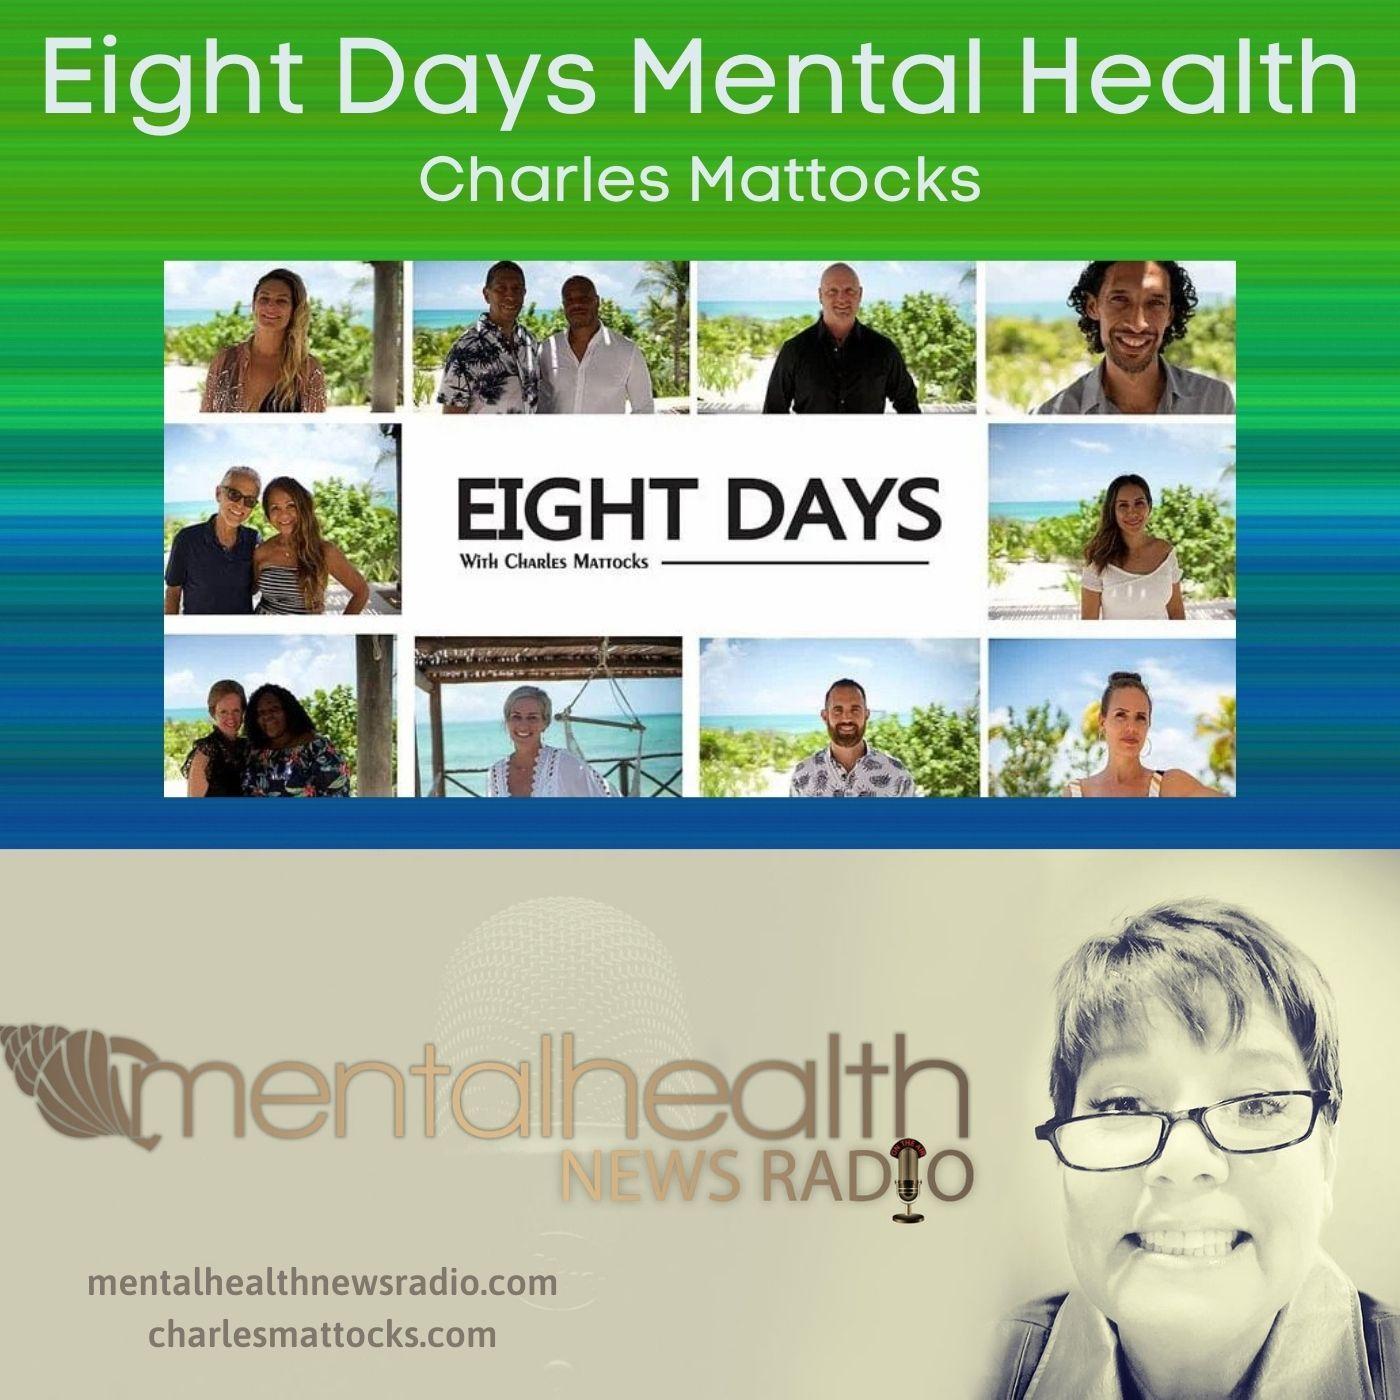 Mental Health News Radio - Eight Days Mental Health with Charles Mattocks